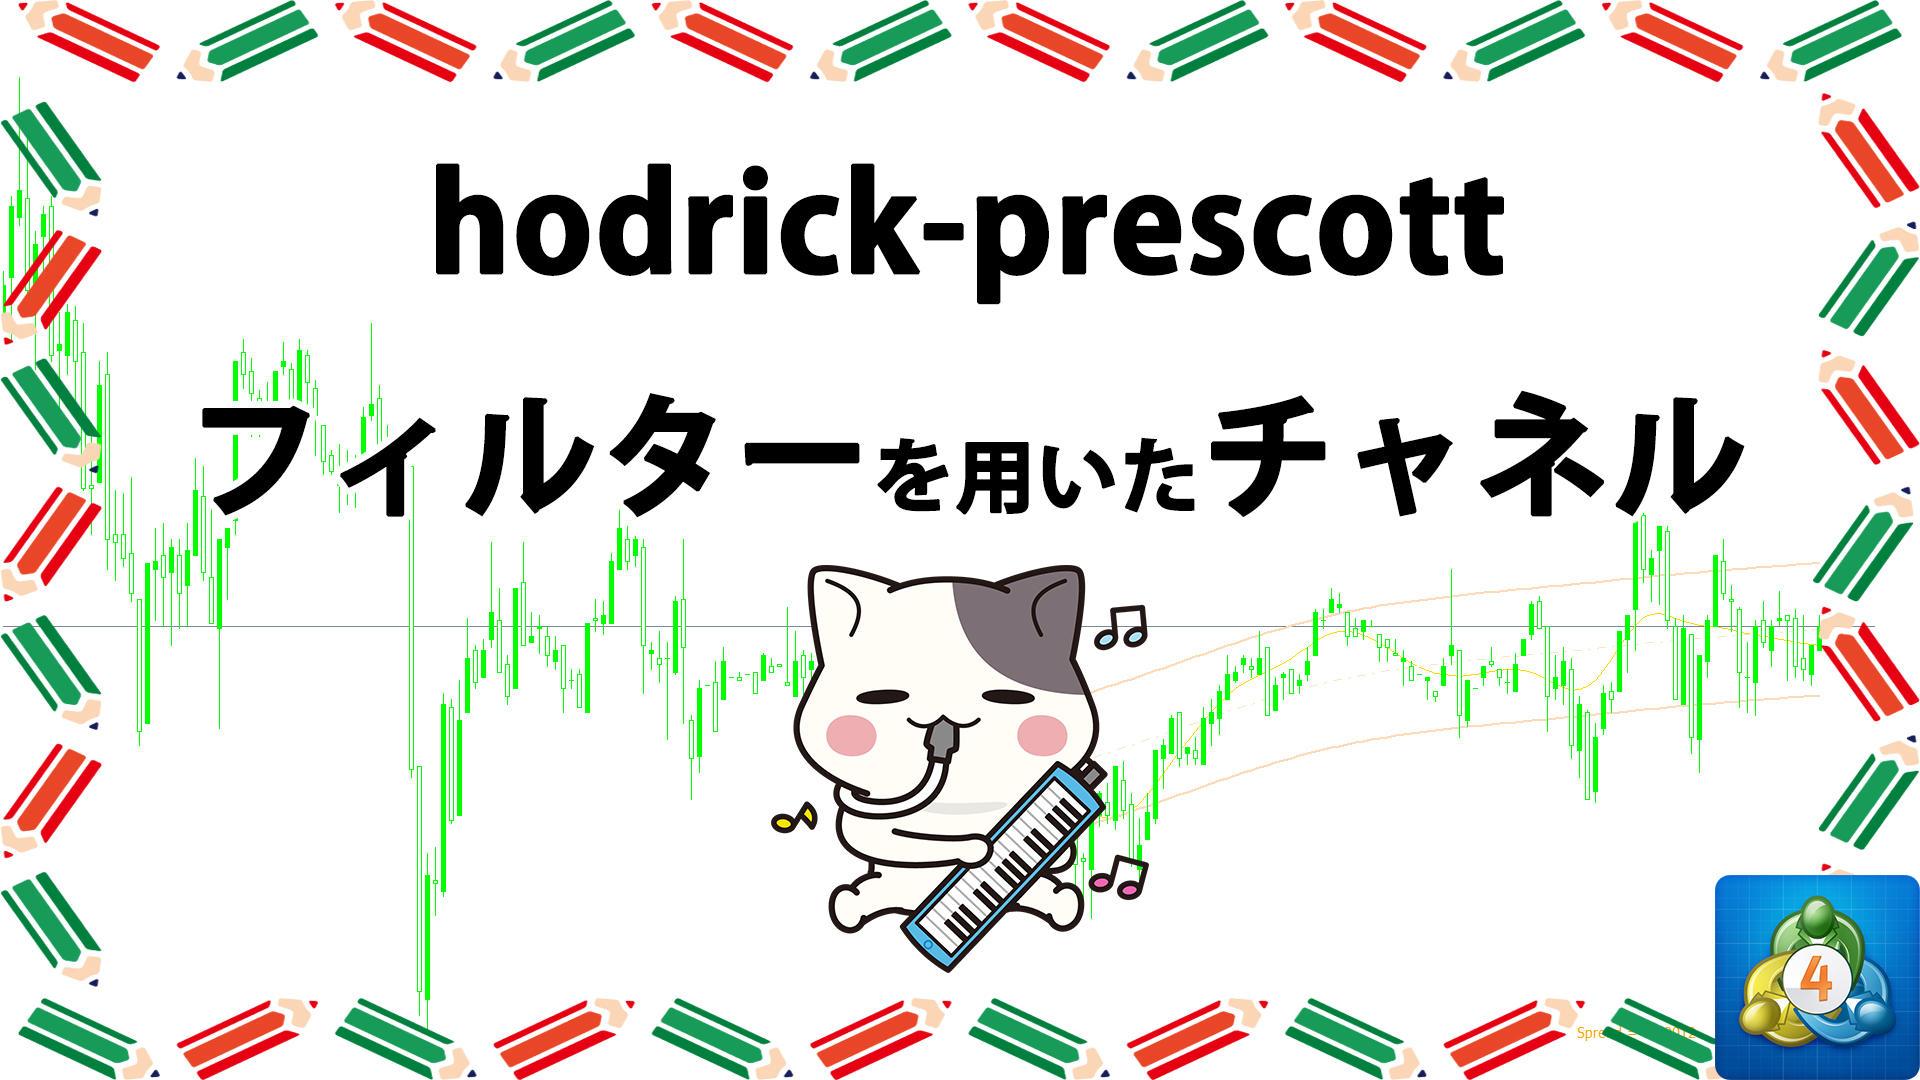 hodrick-prescott_filterを用いたチャネルを表示するMT4インジケーター「vhpchannel_03」